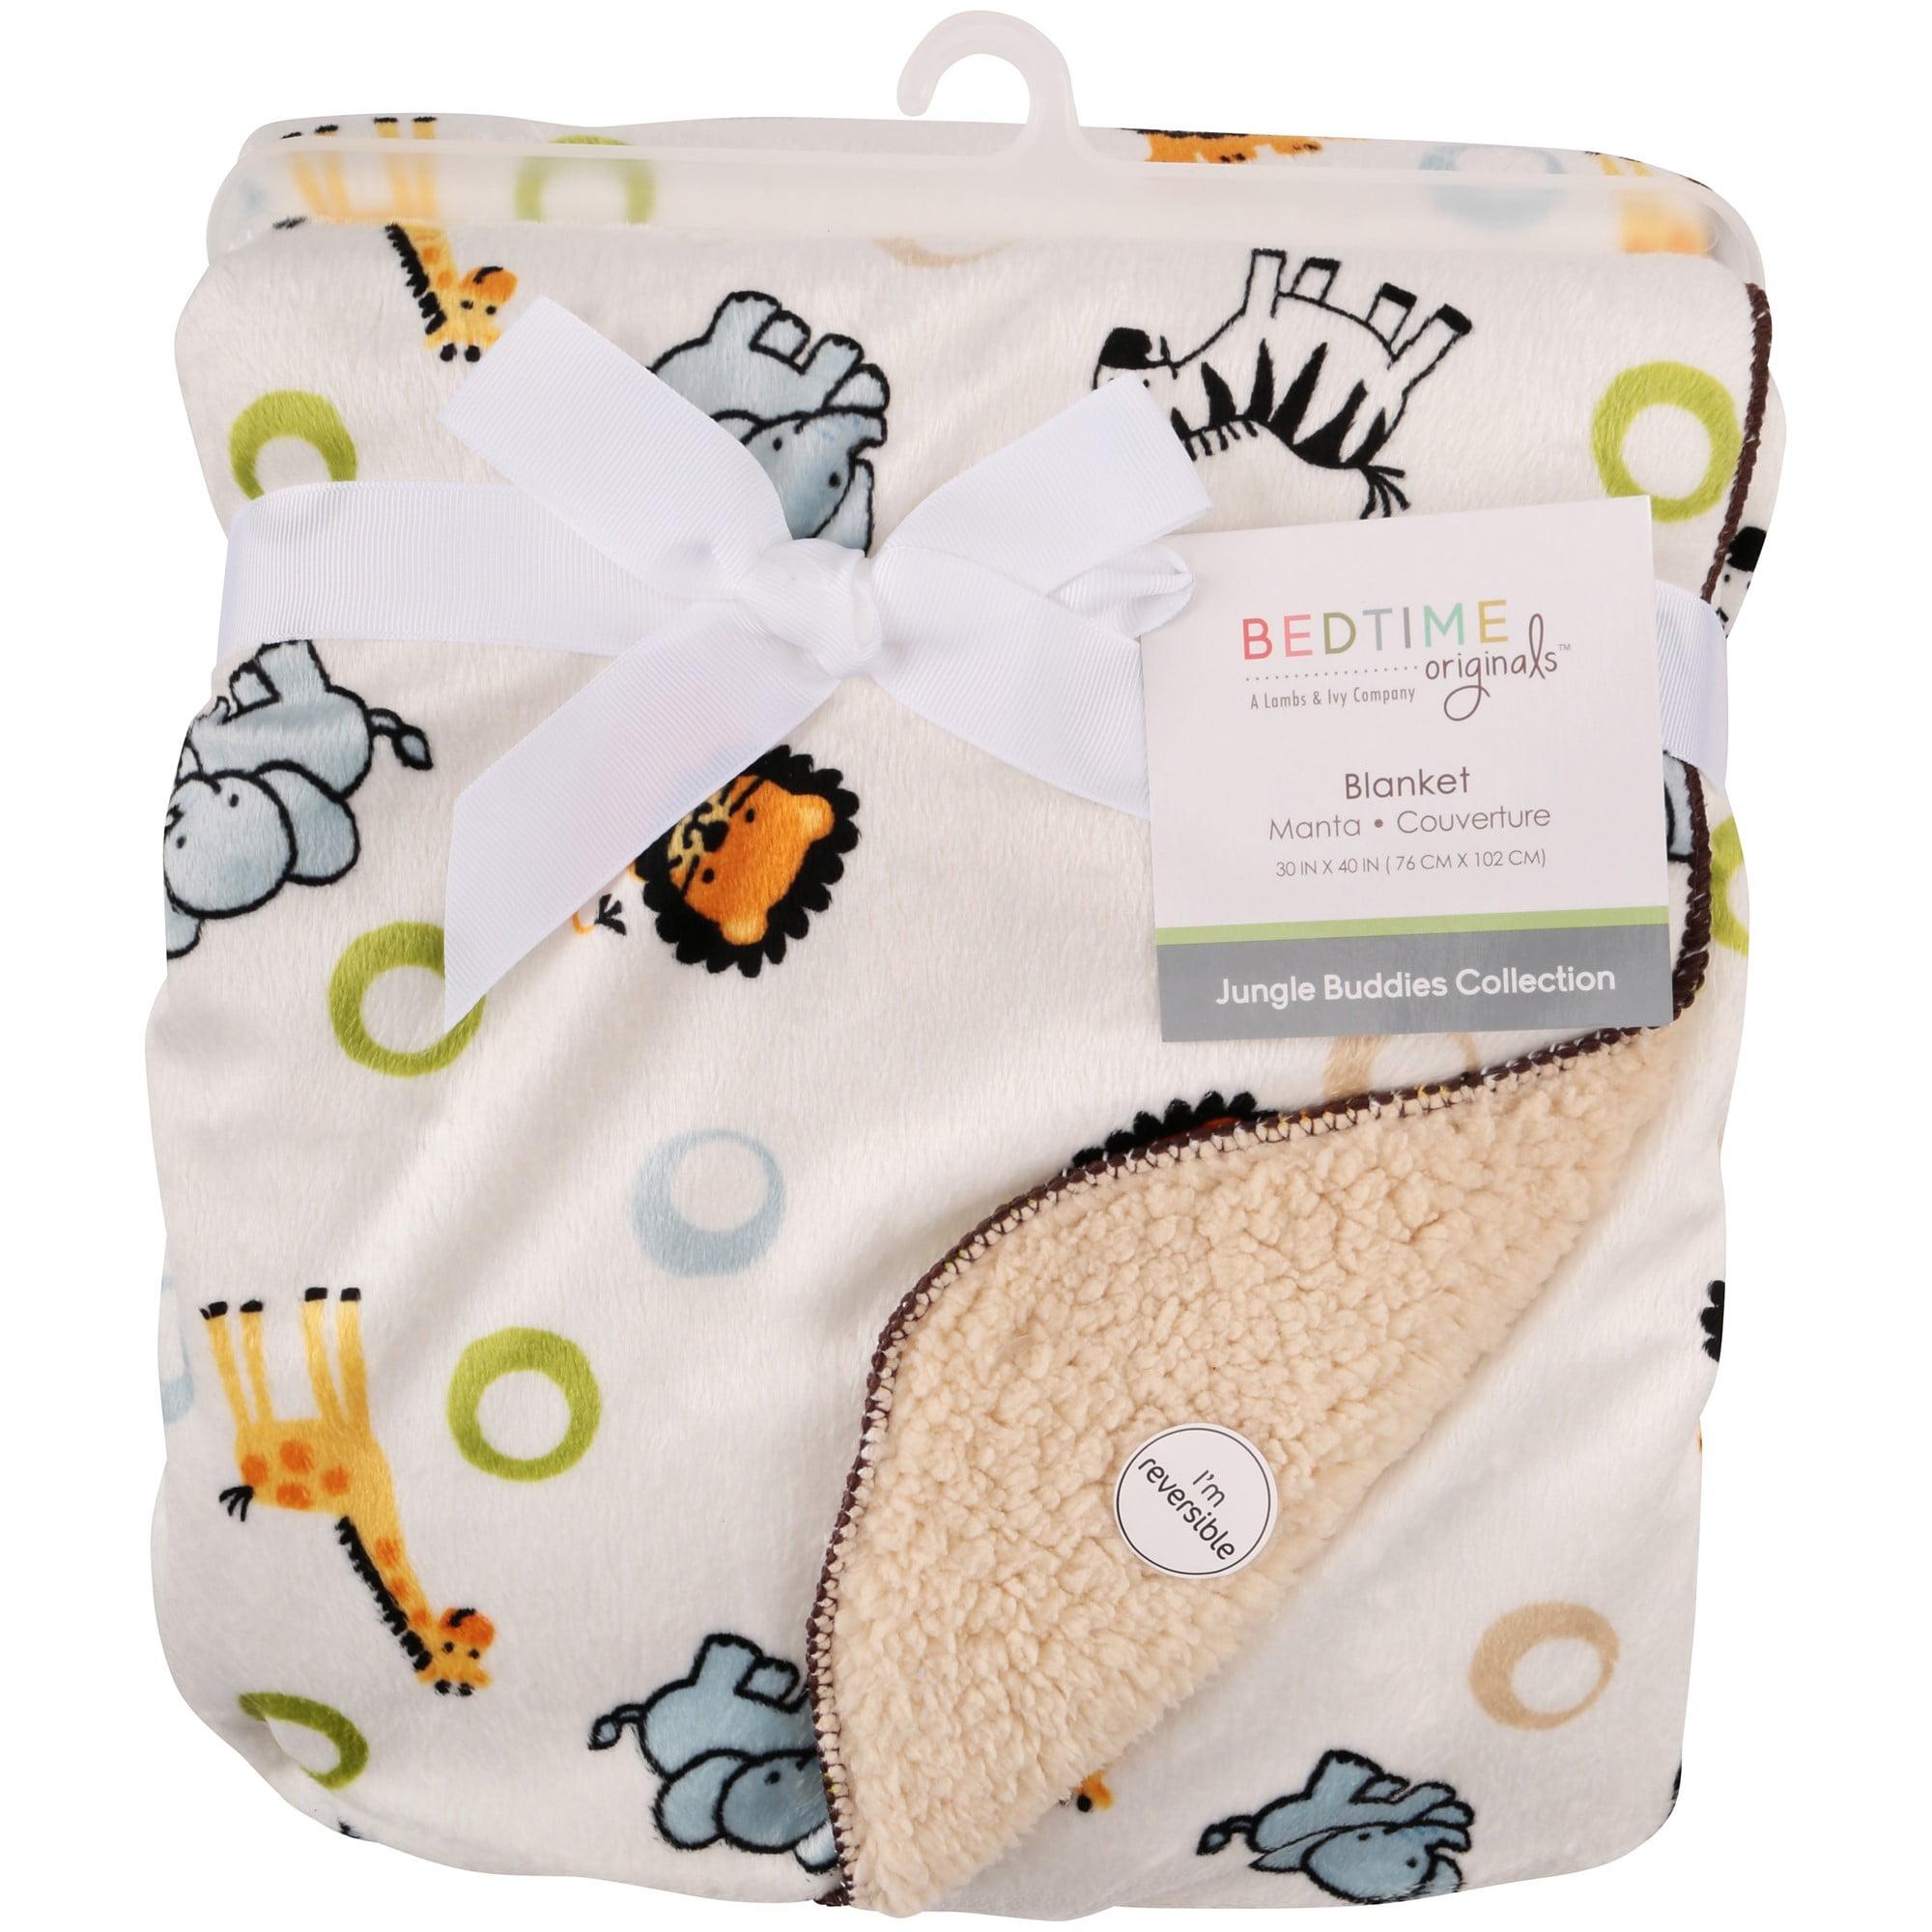 Bedtime Originals® Jungle Buddies Collection Blanket